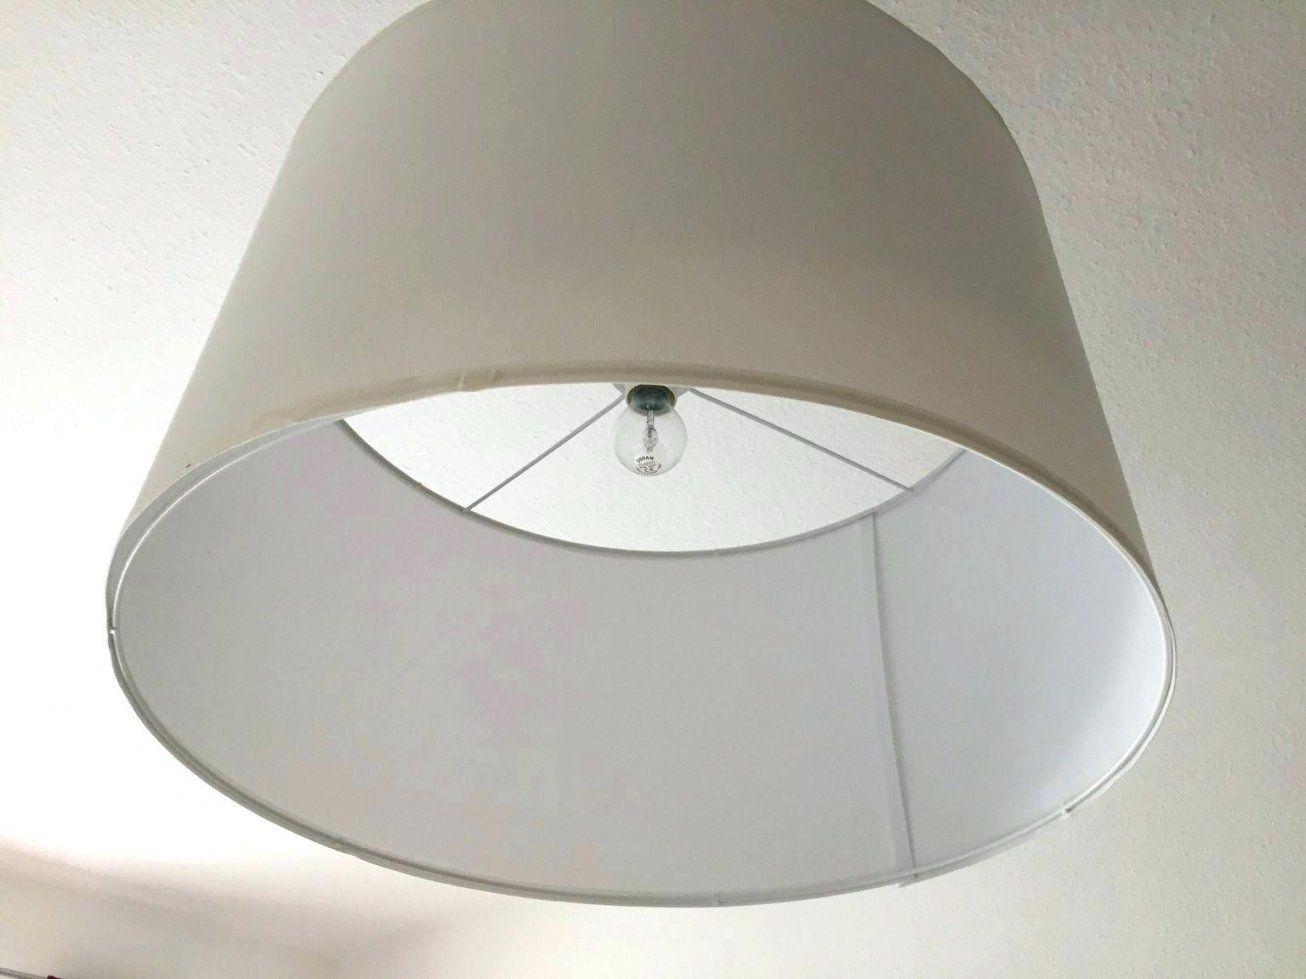 Lampenschirm Selber Machen Stoff Lampenschirme Wien Diy Papier Draht von Lampenschirm Selber Machen Material Bild